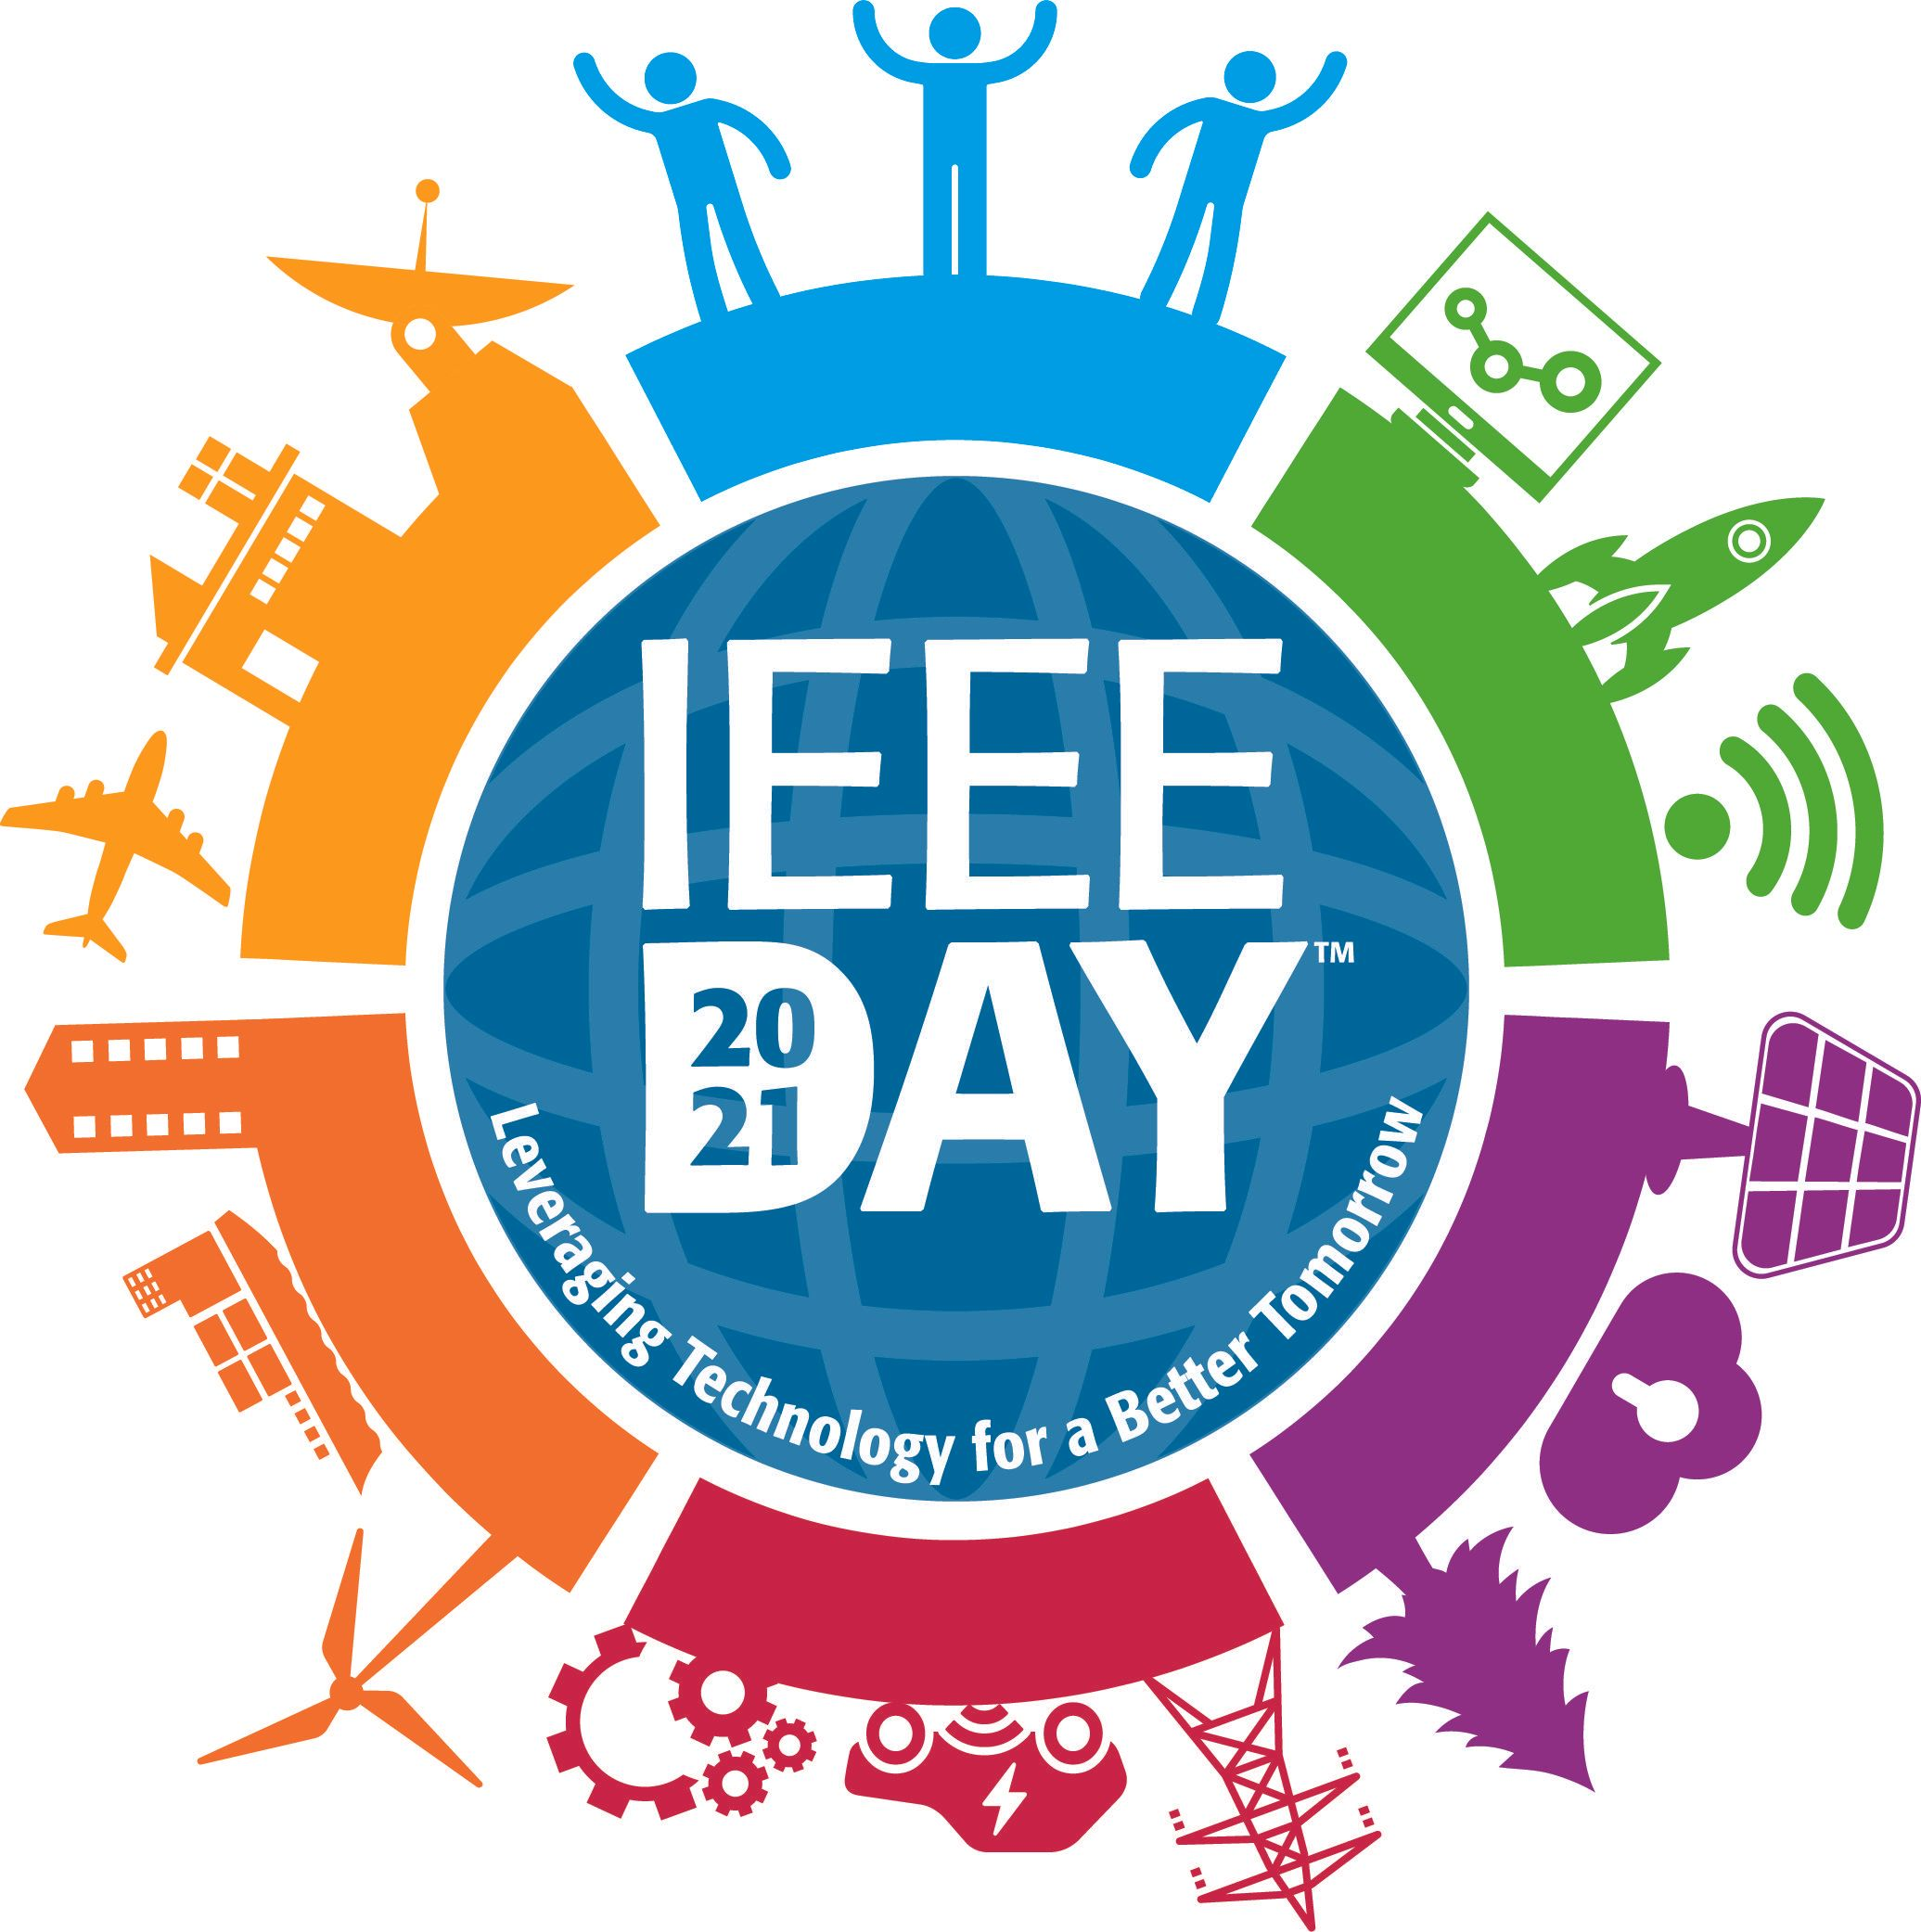 IEEE Day 2021 logo